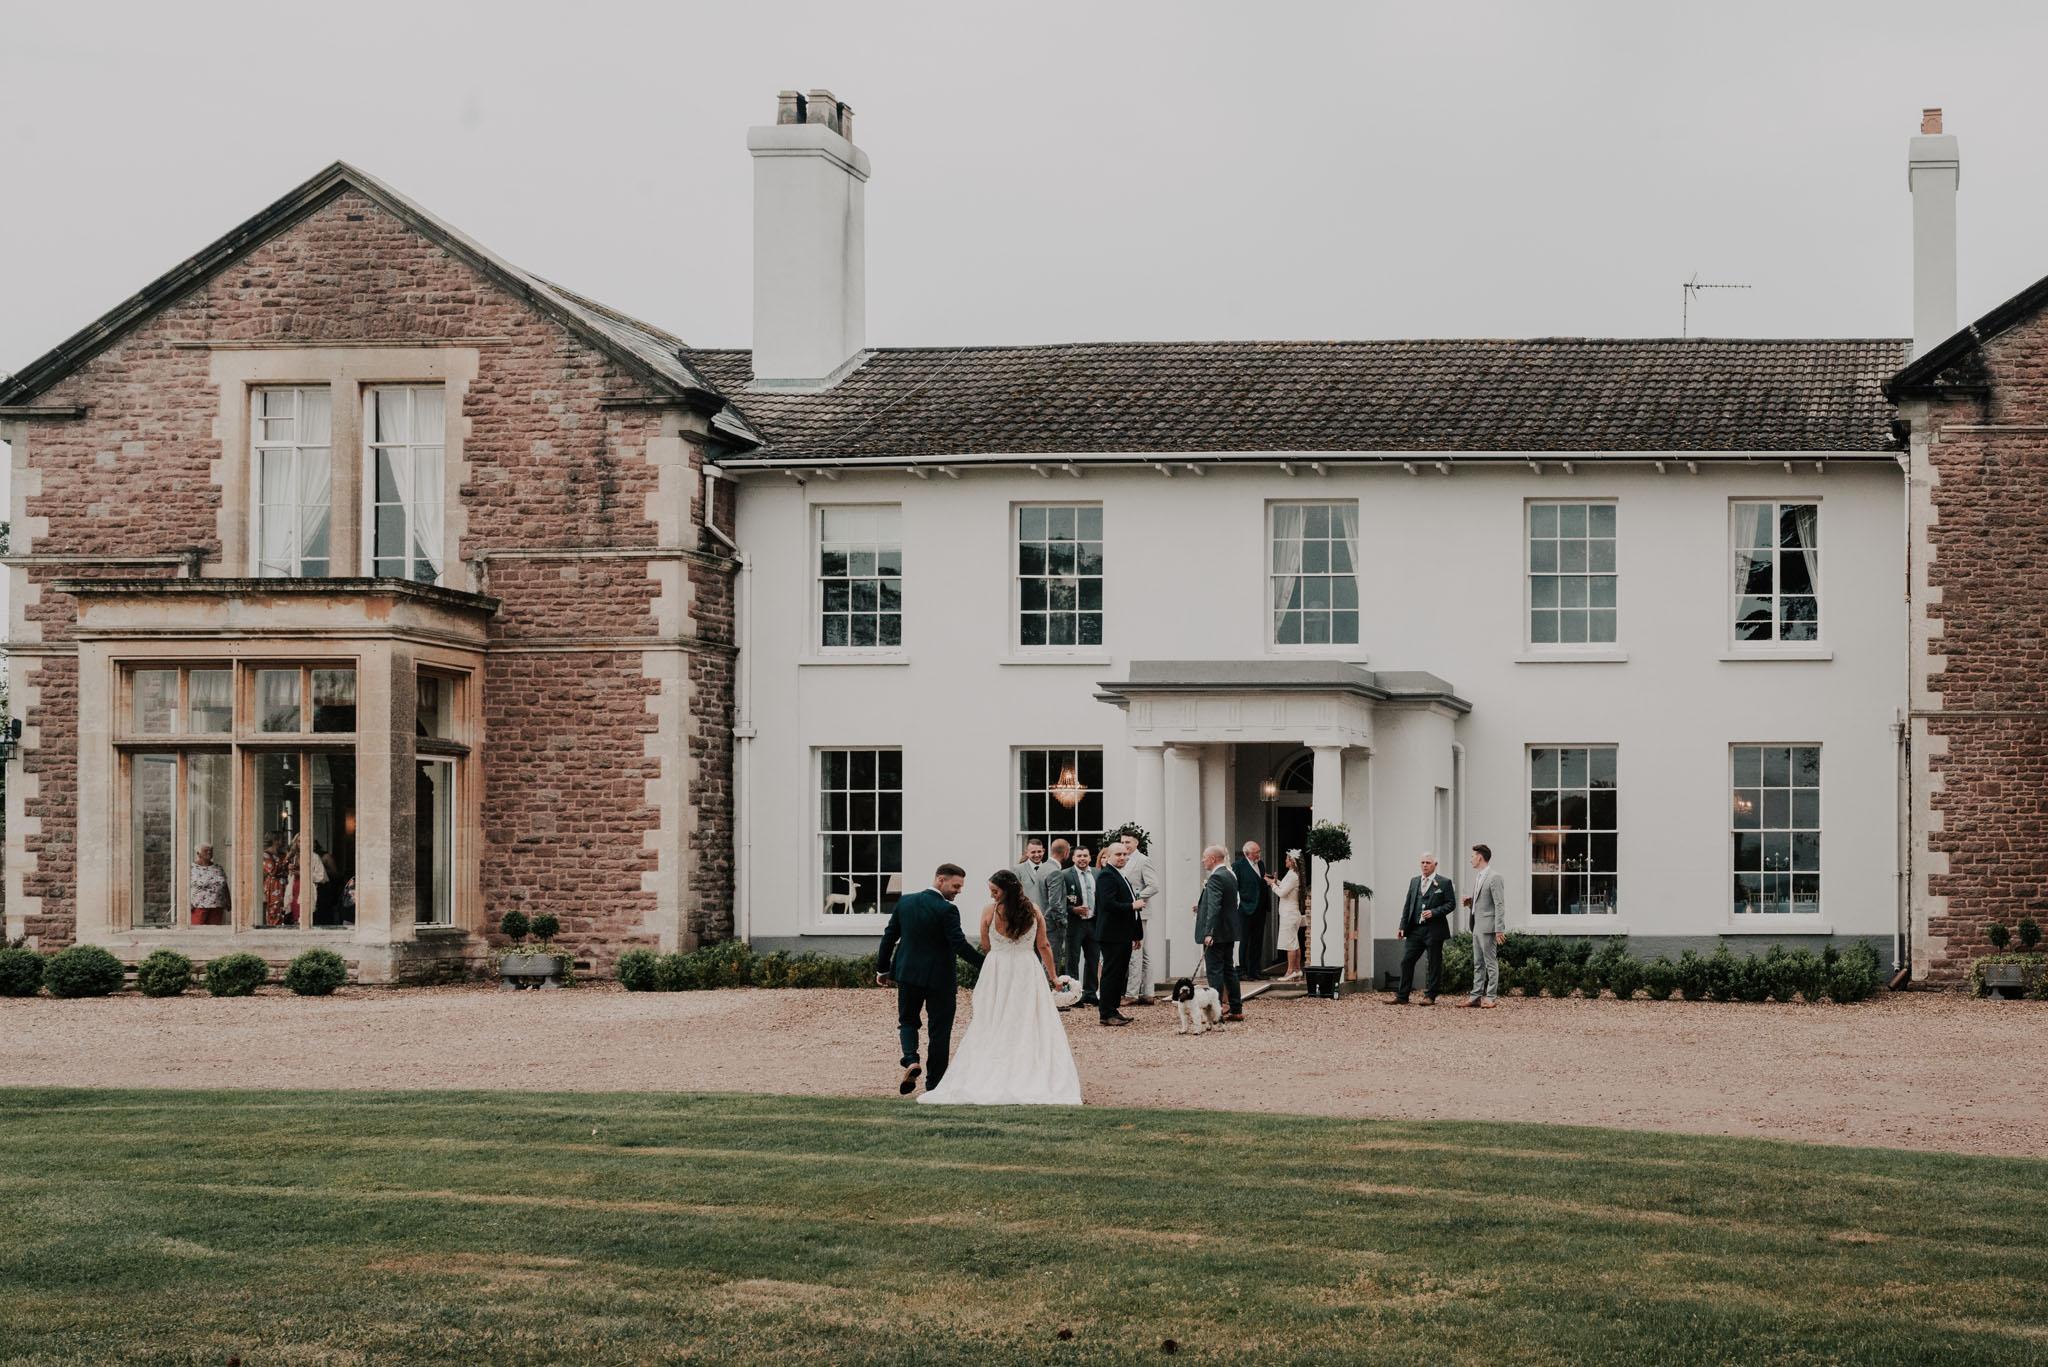 wedding-photographer-glewstone-court-hereford-scott-stockwell-photography357.jpg